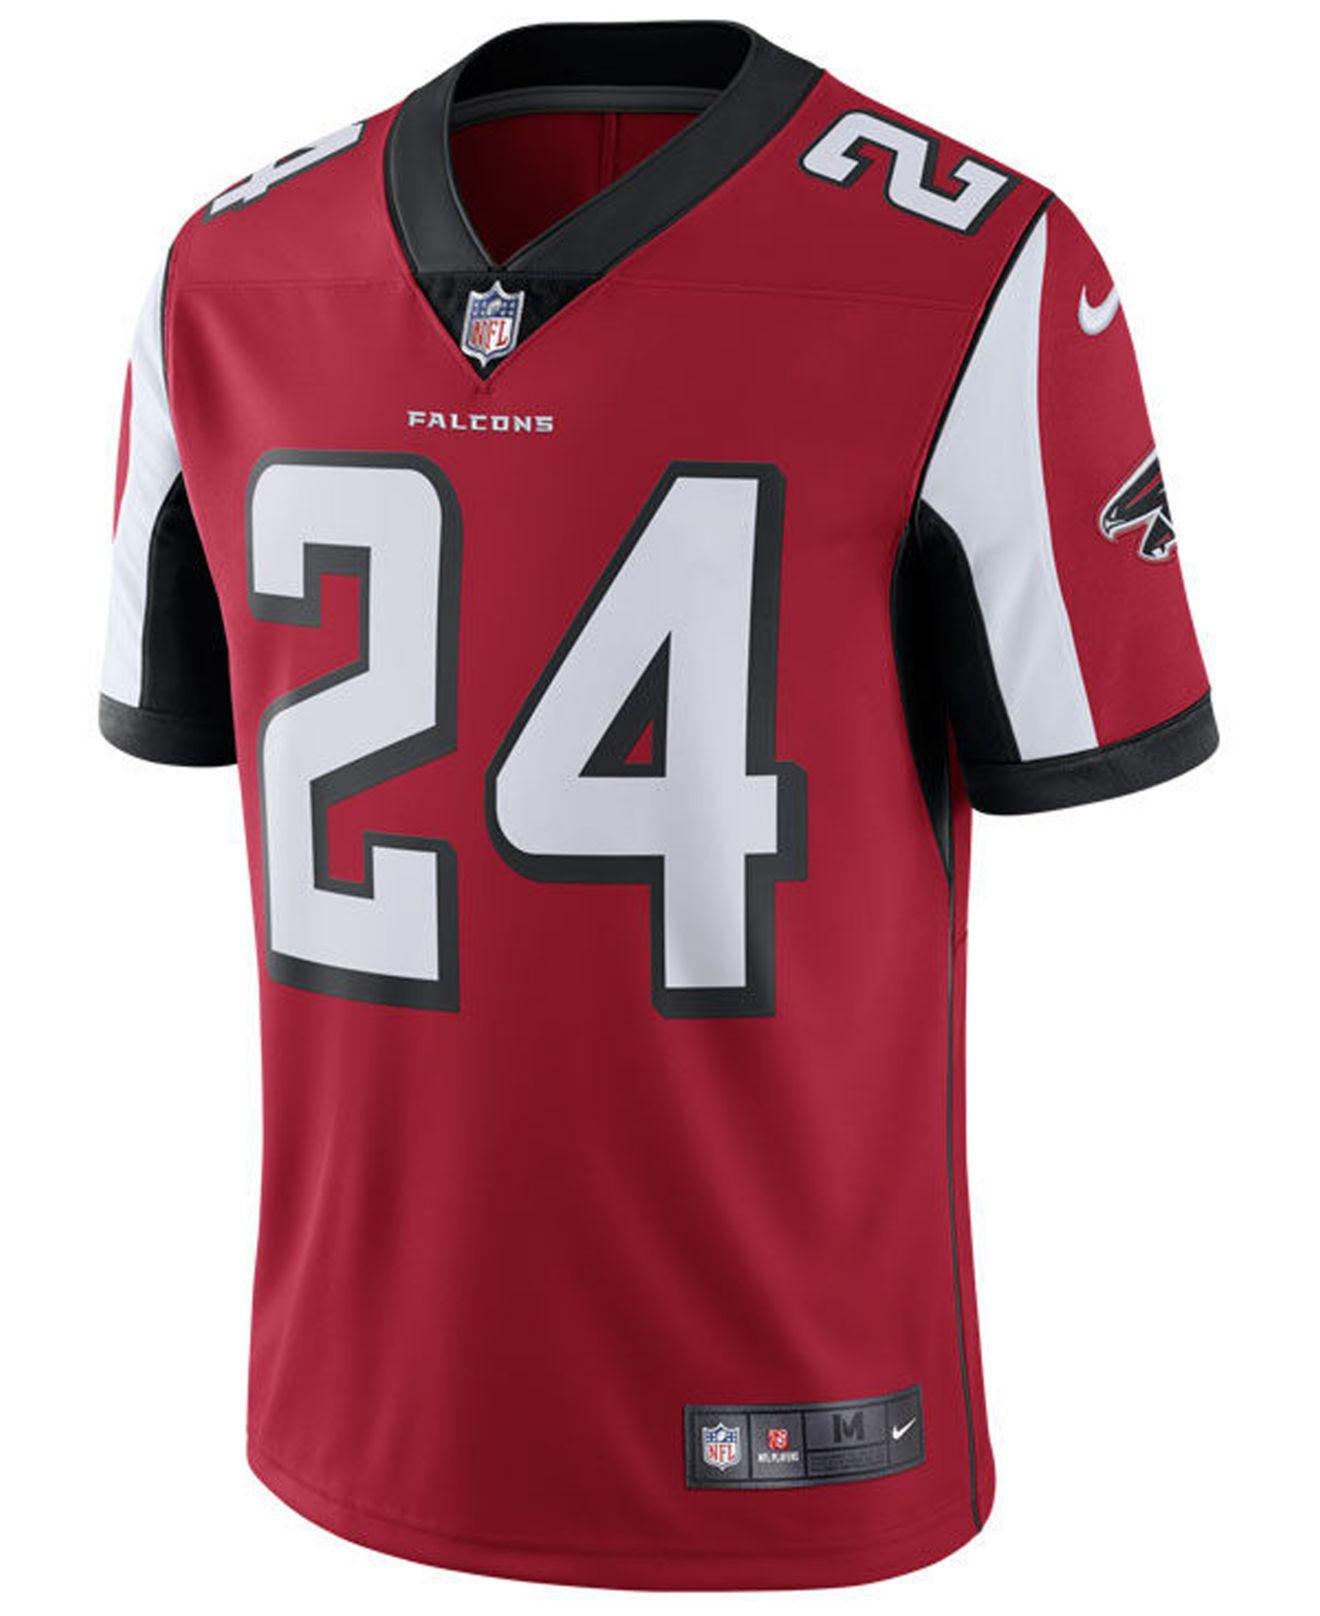 Lyst - Nike Devonta Freeman Atlanta Falcons Vapor Untouchable Limited Jersey  in Red for Men 8b8151410